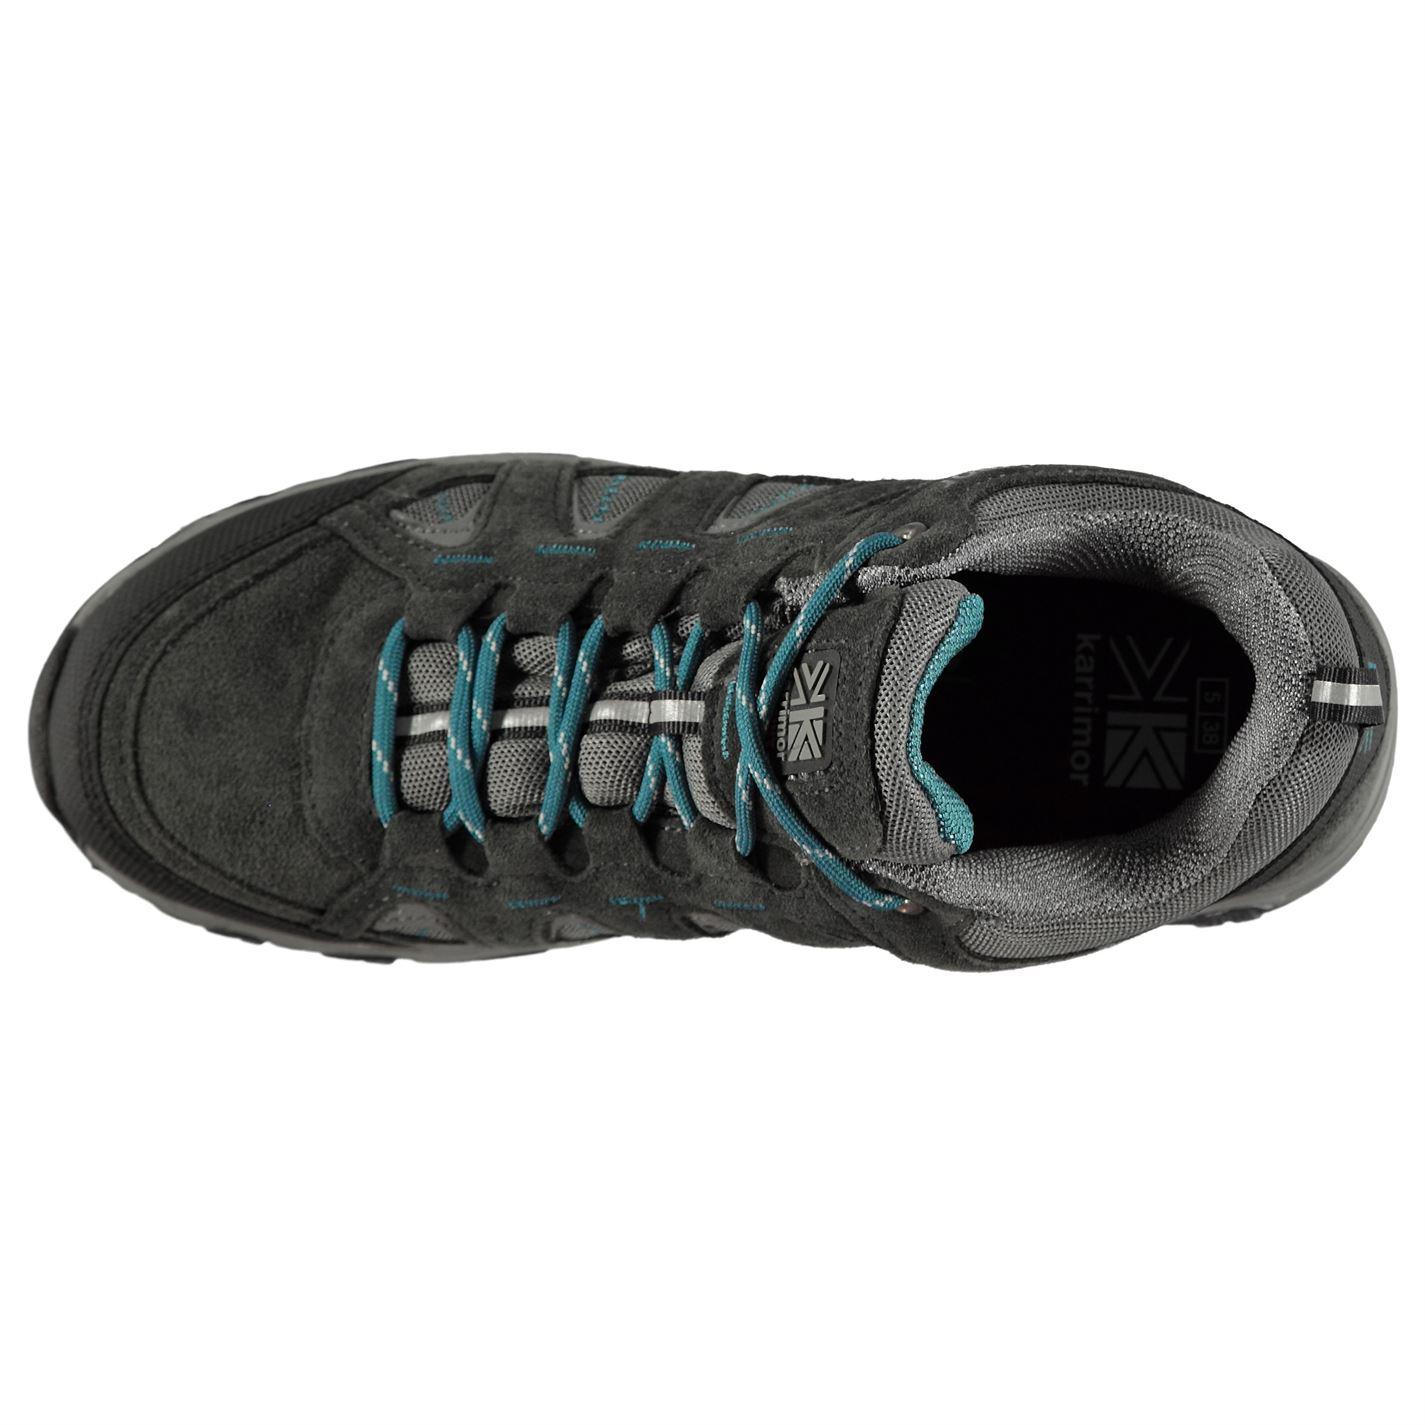 Karrimor Kids Mount Low Junior Walking Shoes Waterproof Lace Up Breathable